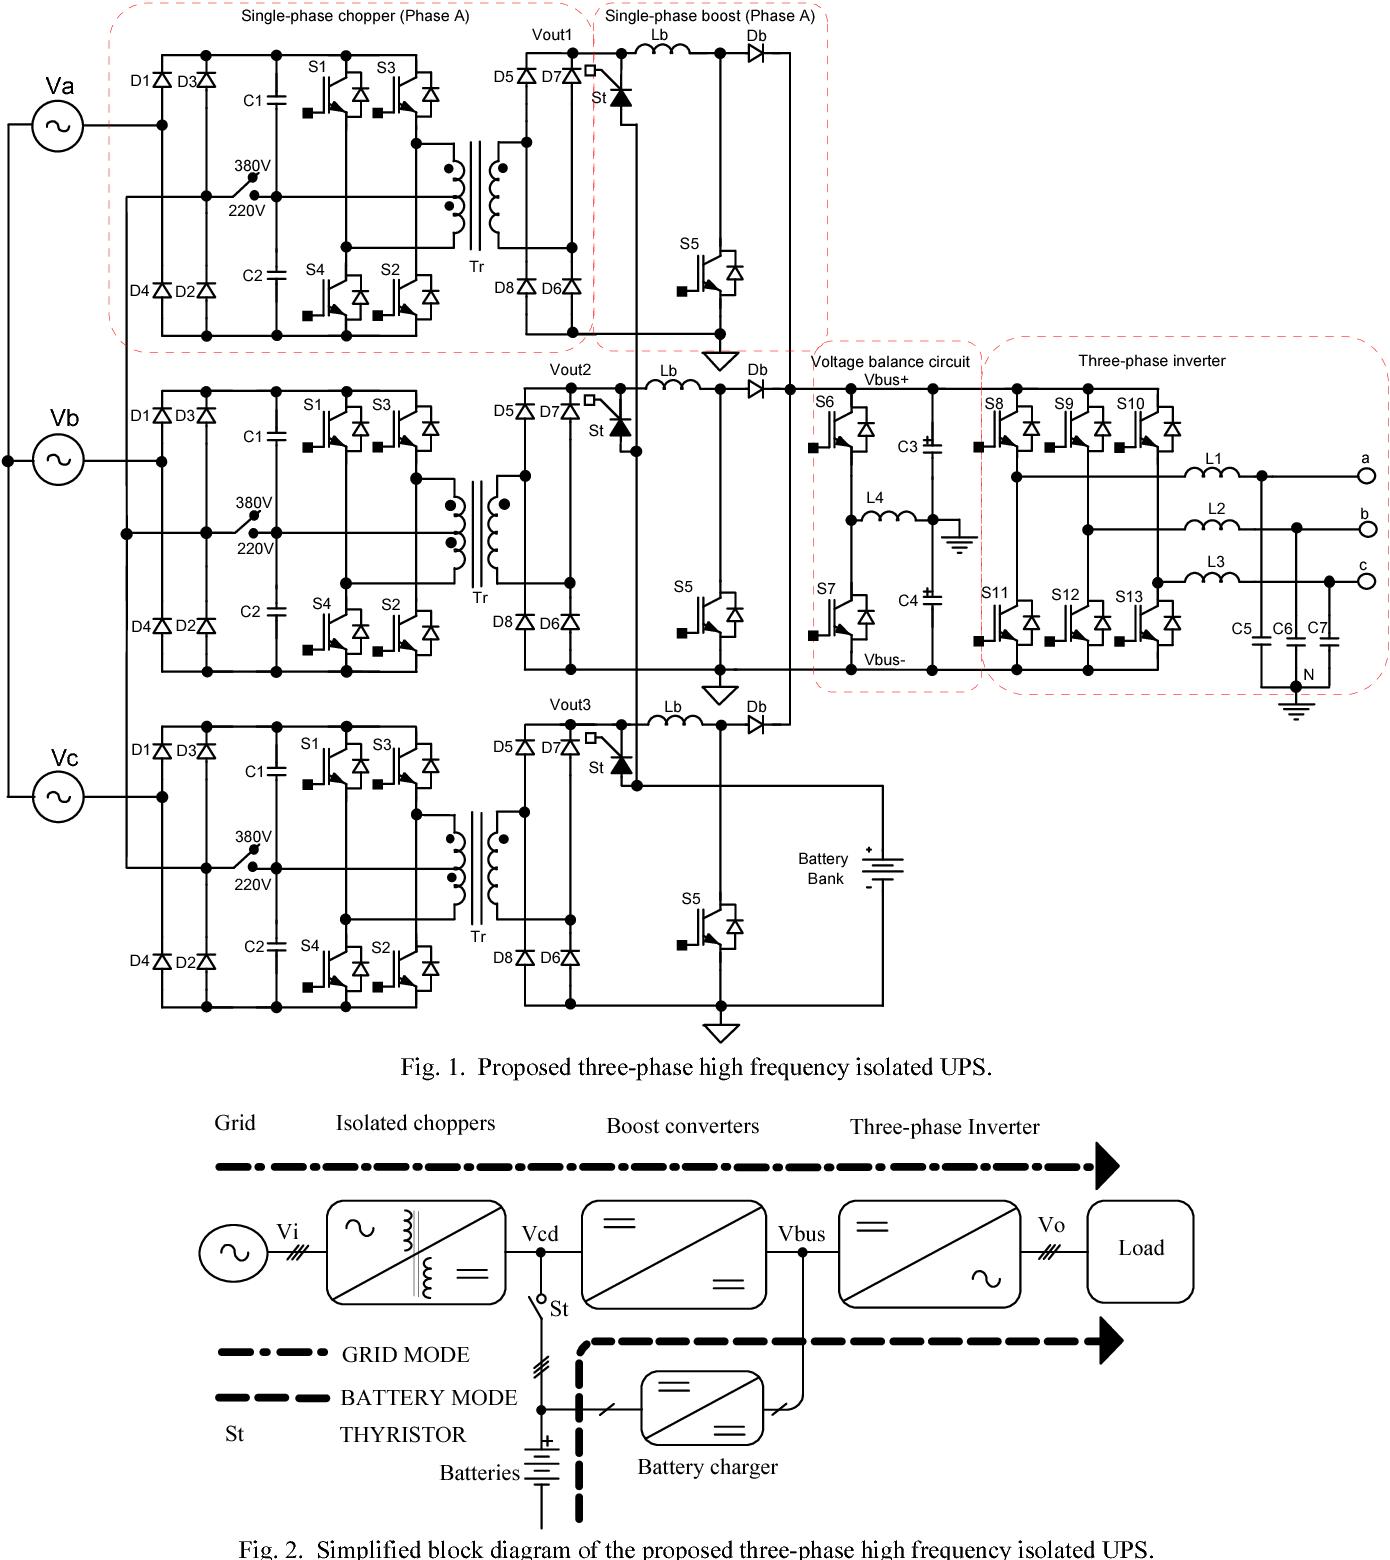 Three-phase 15kVA UPS system with power factor correction